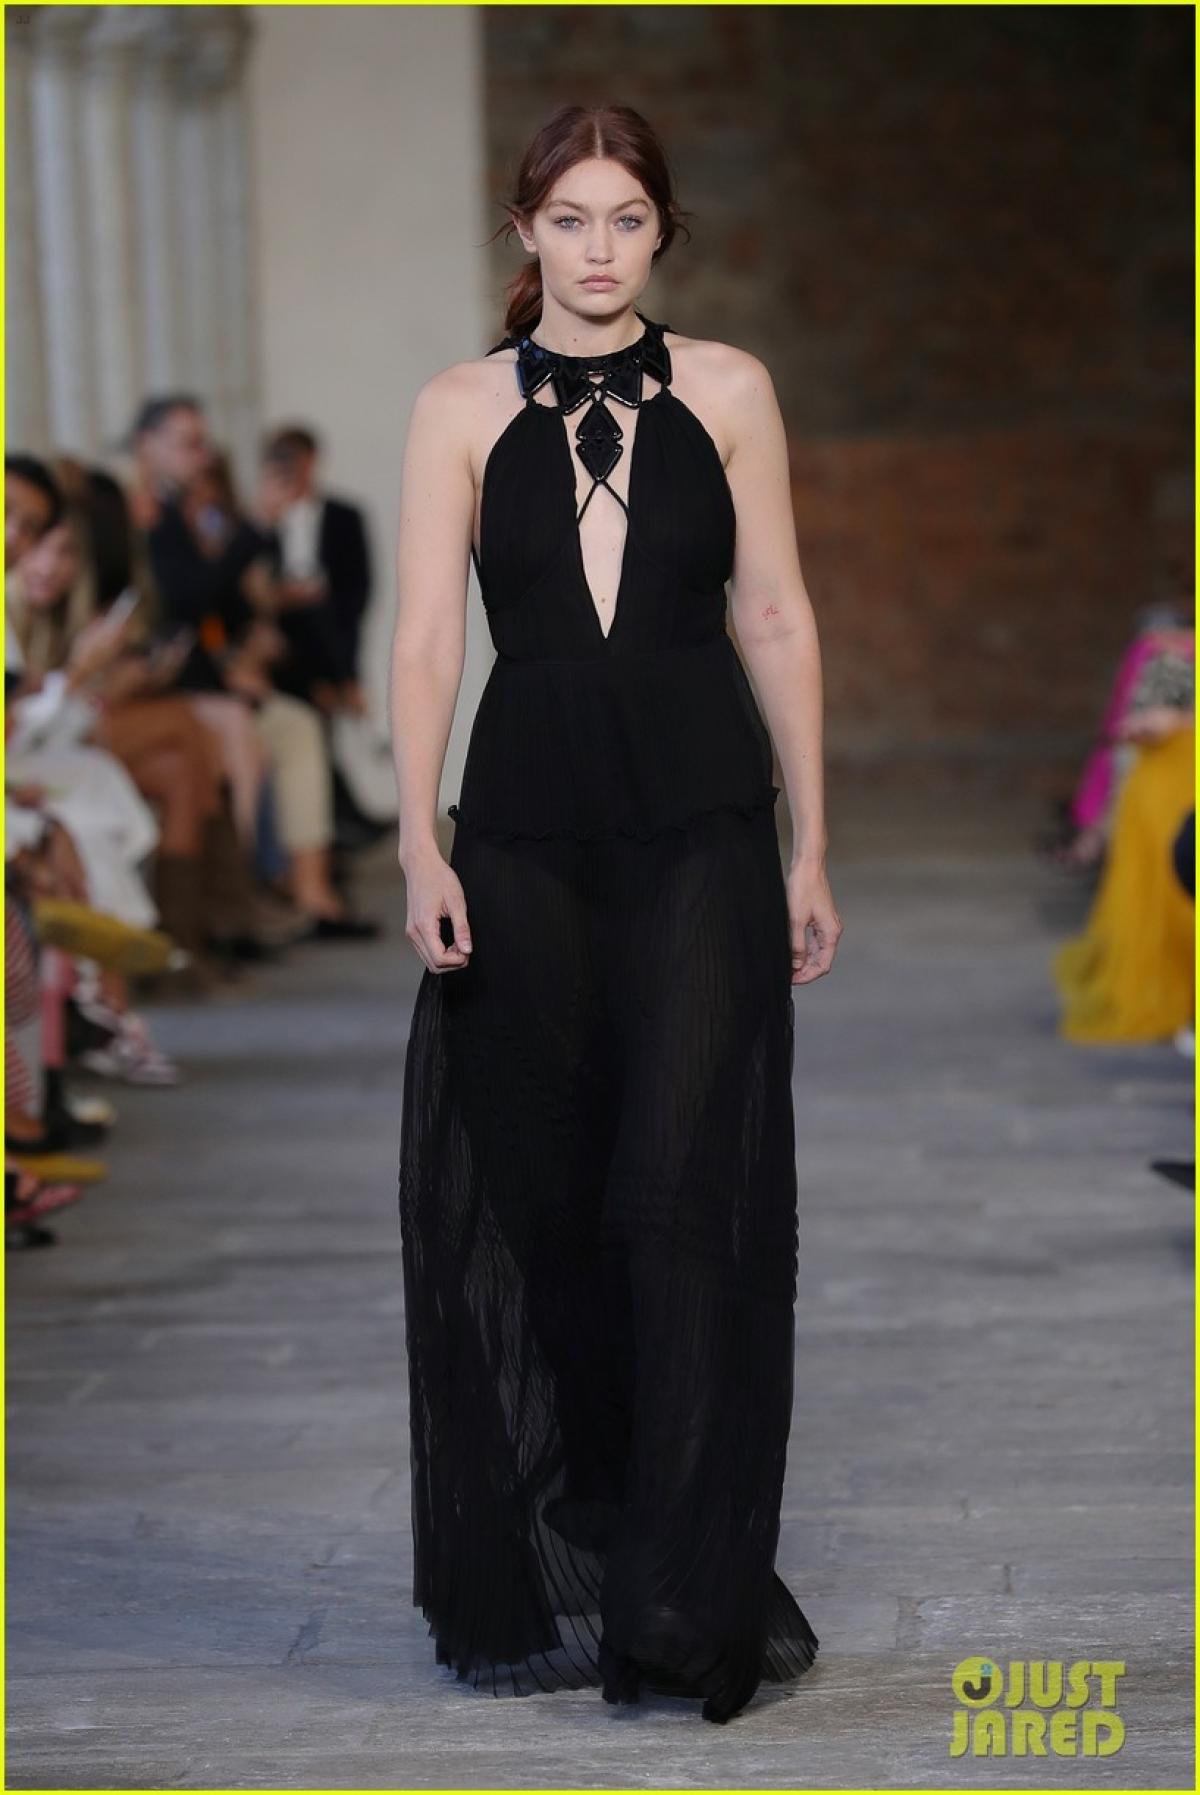 Gigi Hadid tham dự show diễn của Alberta Ferretti tại Tuần lễ thời trang Milan diễn ra tại Italy.